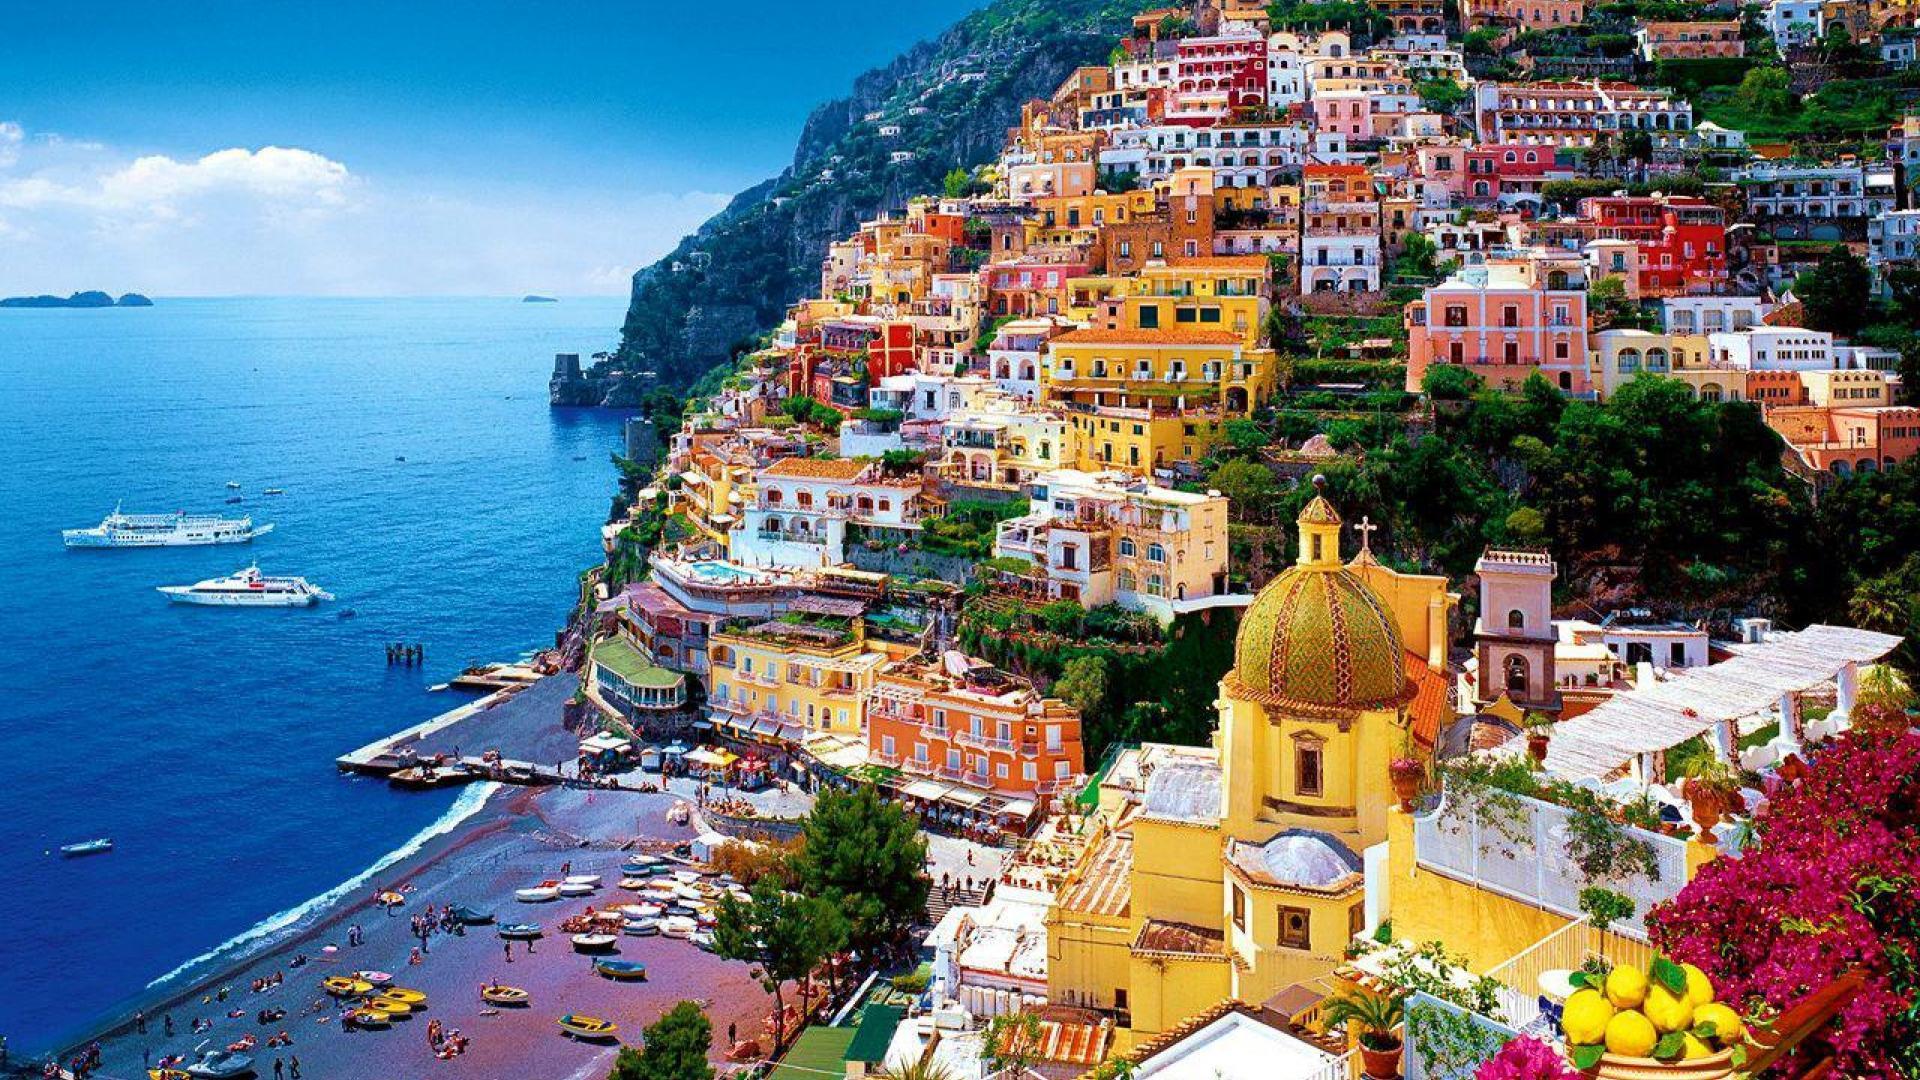 1920x1080_positano_amalfi_coast_italy-1557604